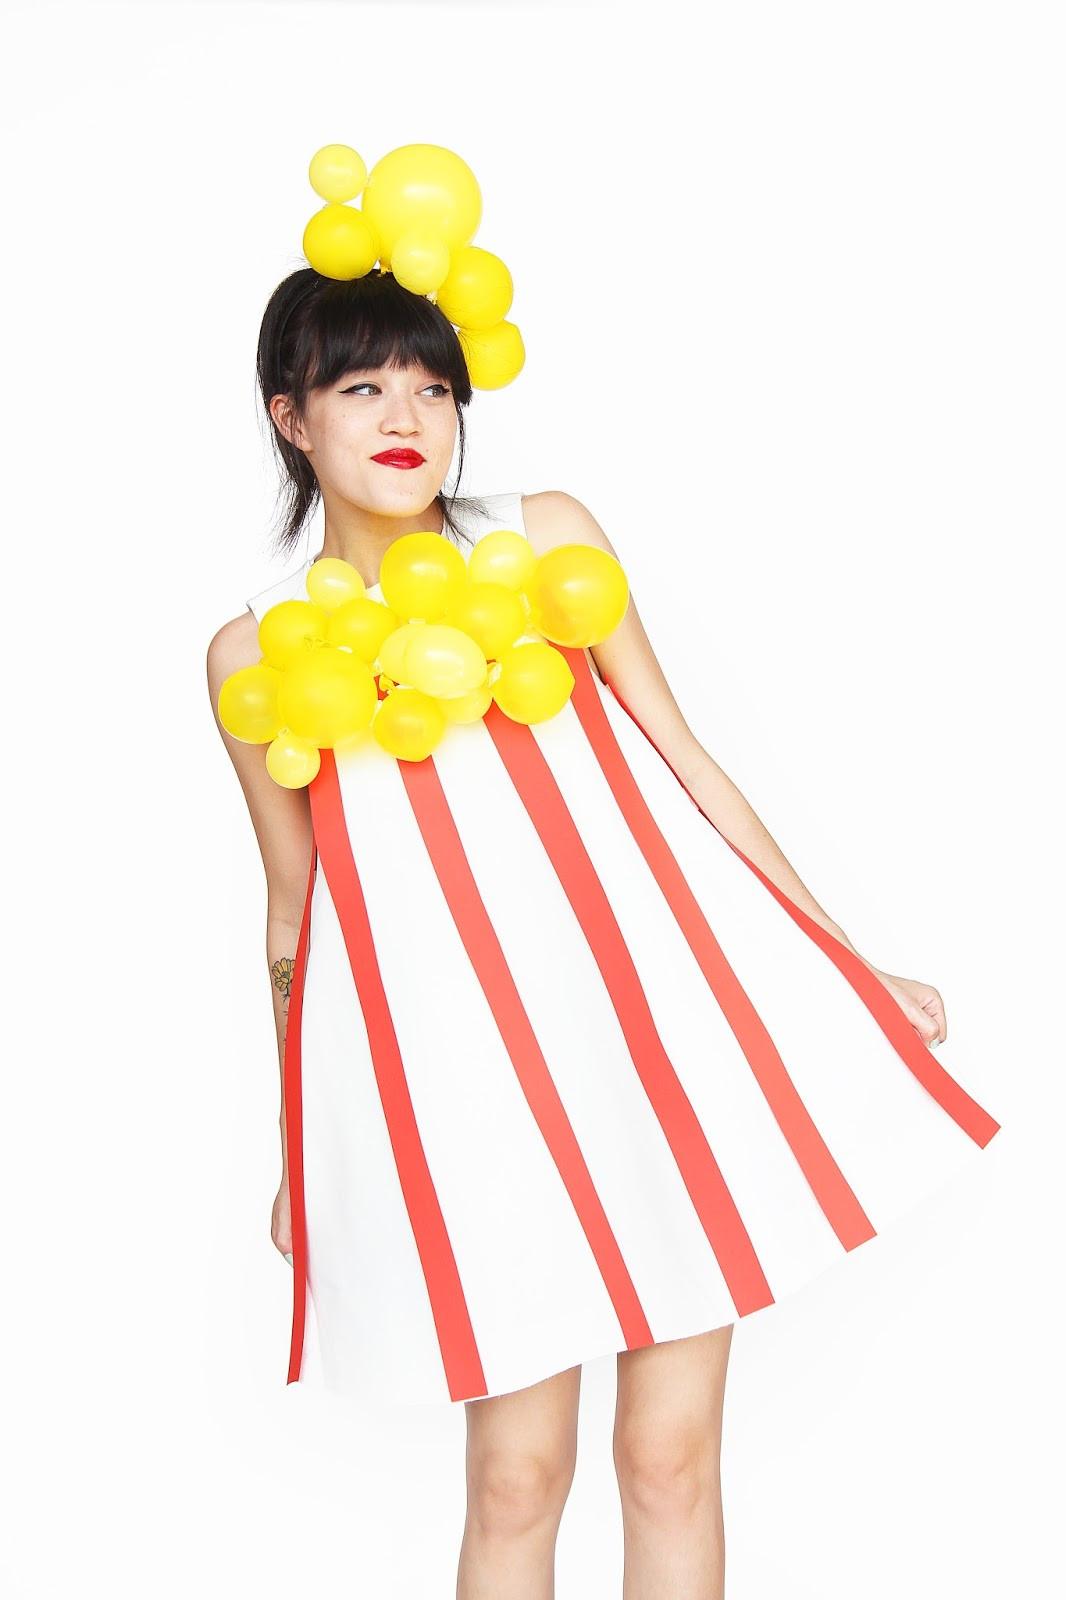 Halloween Diy Kostüm  Aww Sam DIY Popcorn Halloween Costume